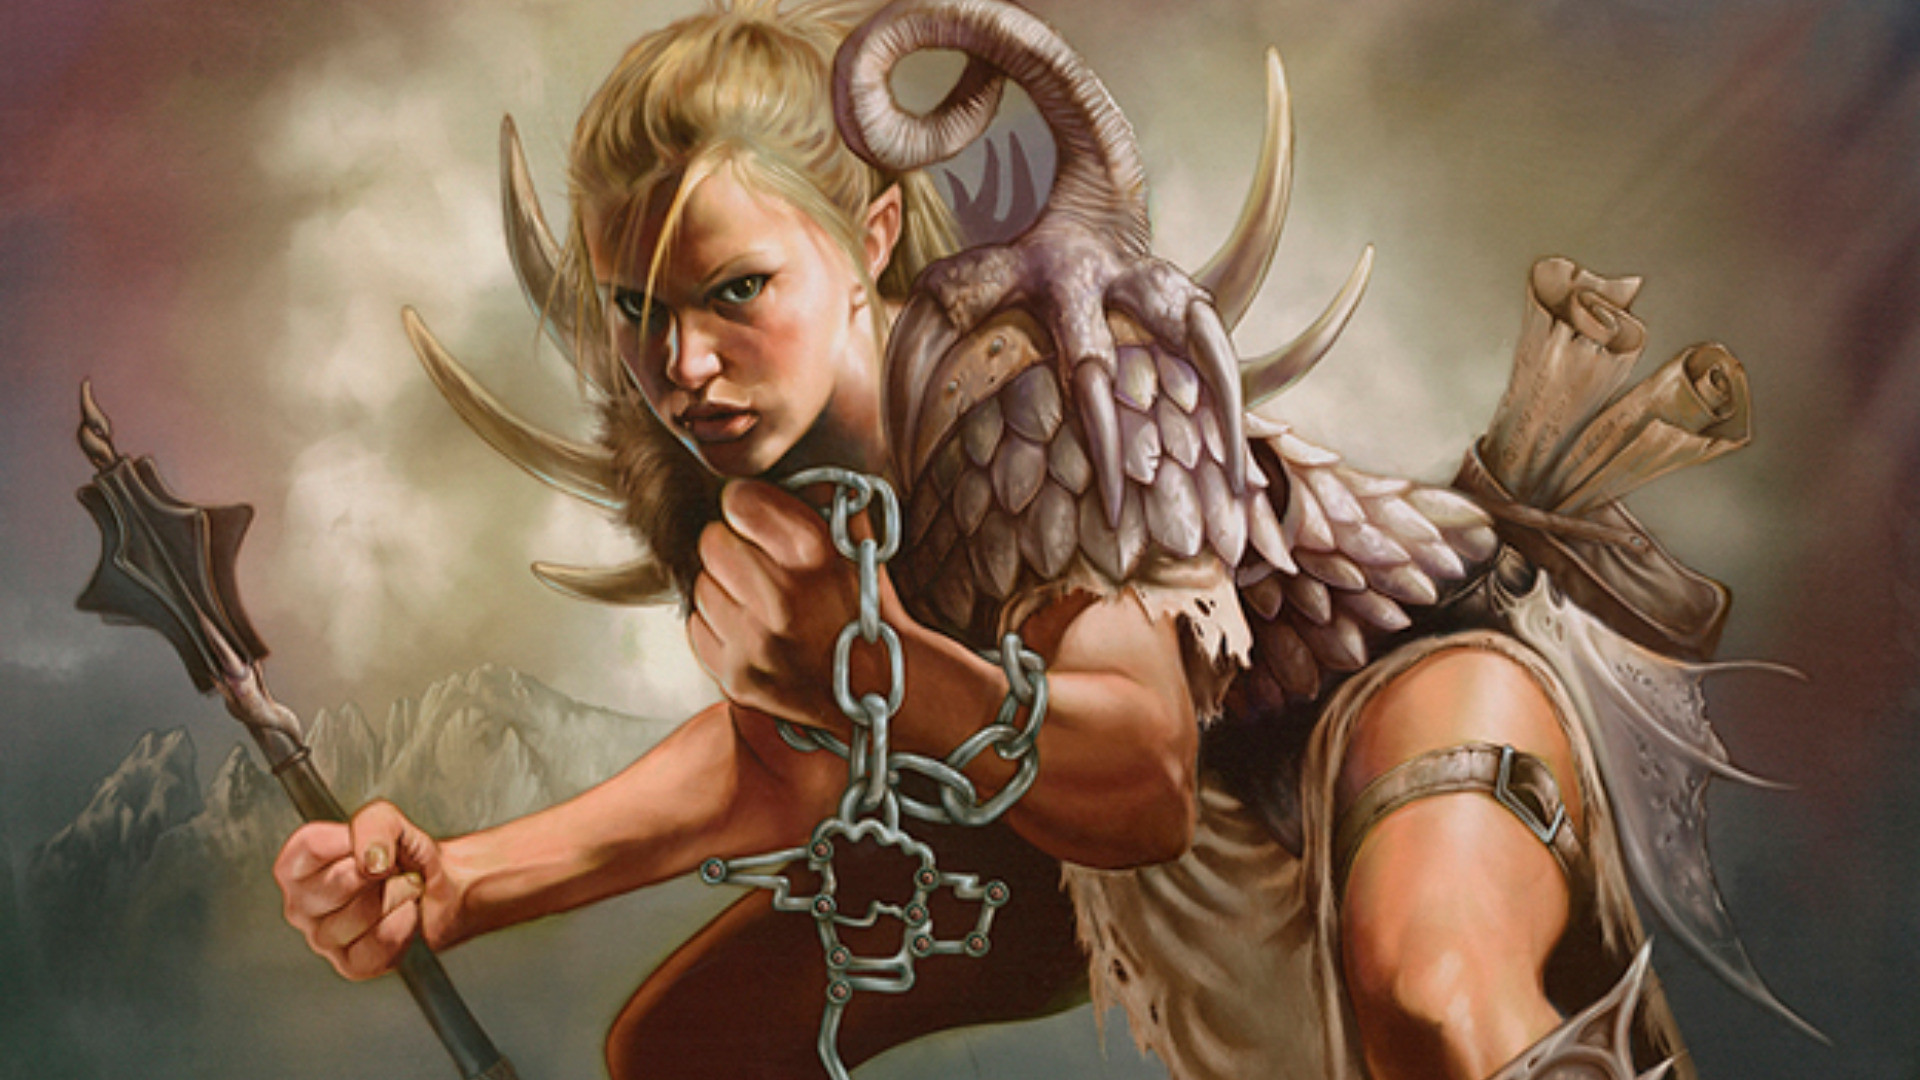 Women Warrior Full HD Wallpaper and Background x ID 1920×1080